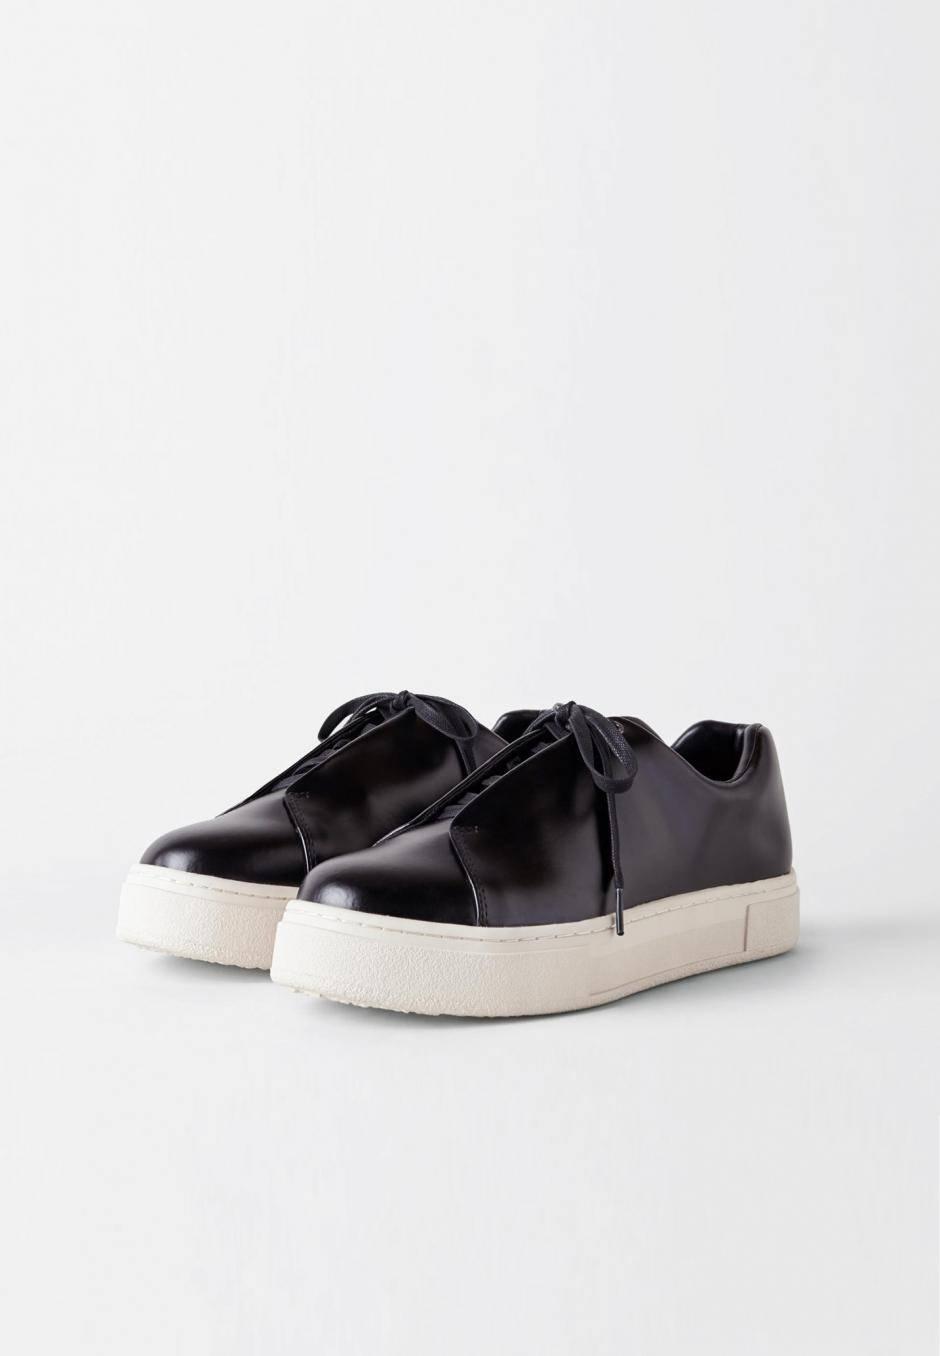 Eytys Doja leather svart